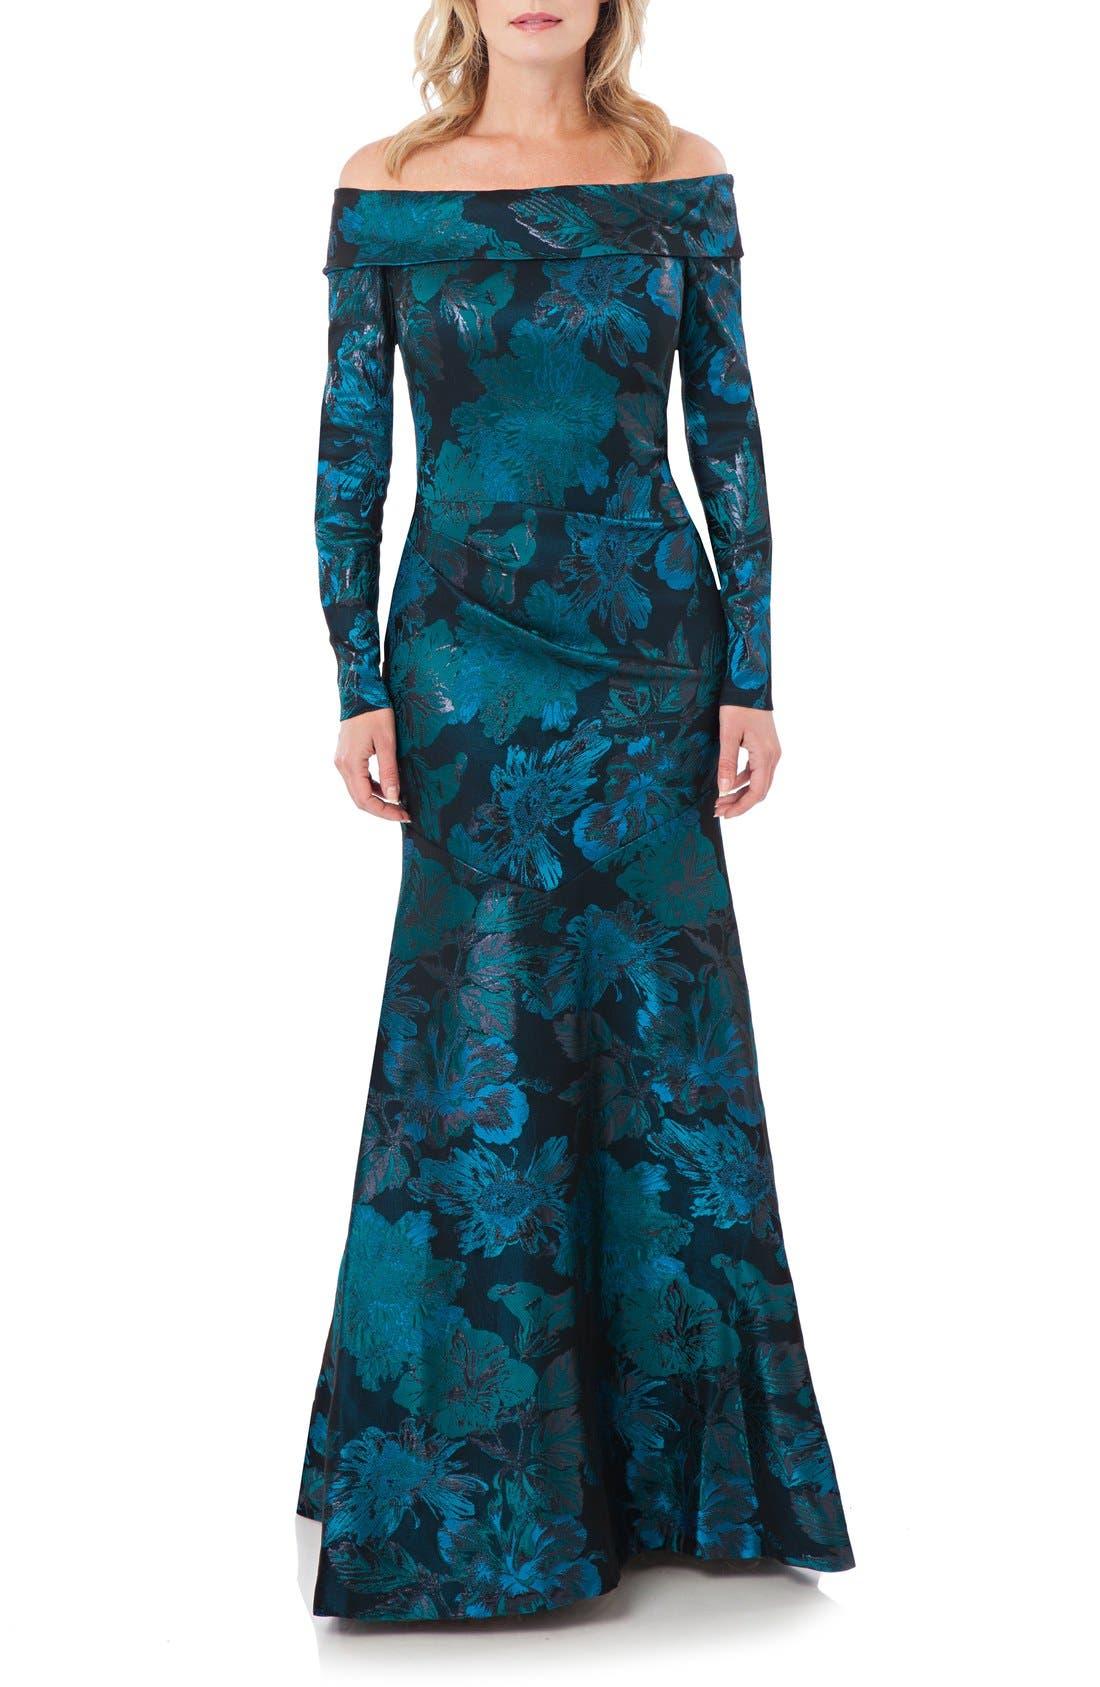 Alternate Image 1 Selected - Theia Metallic Floral Jacquard Mermaid Gown